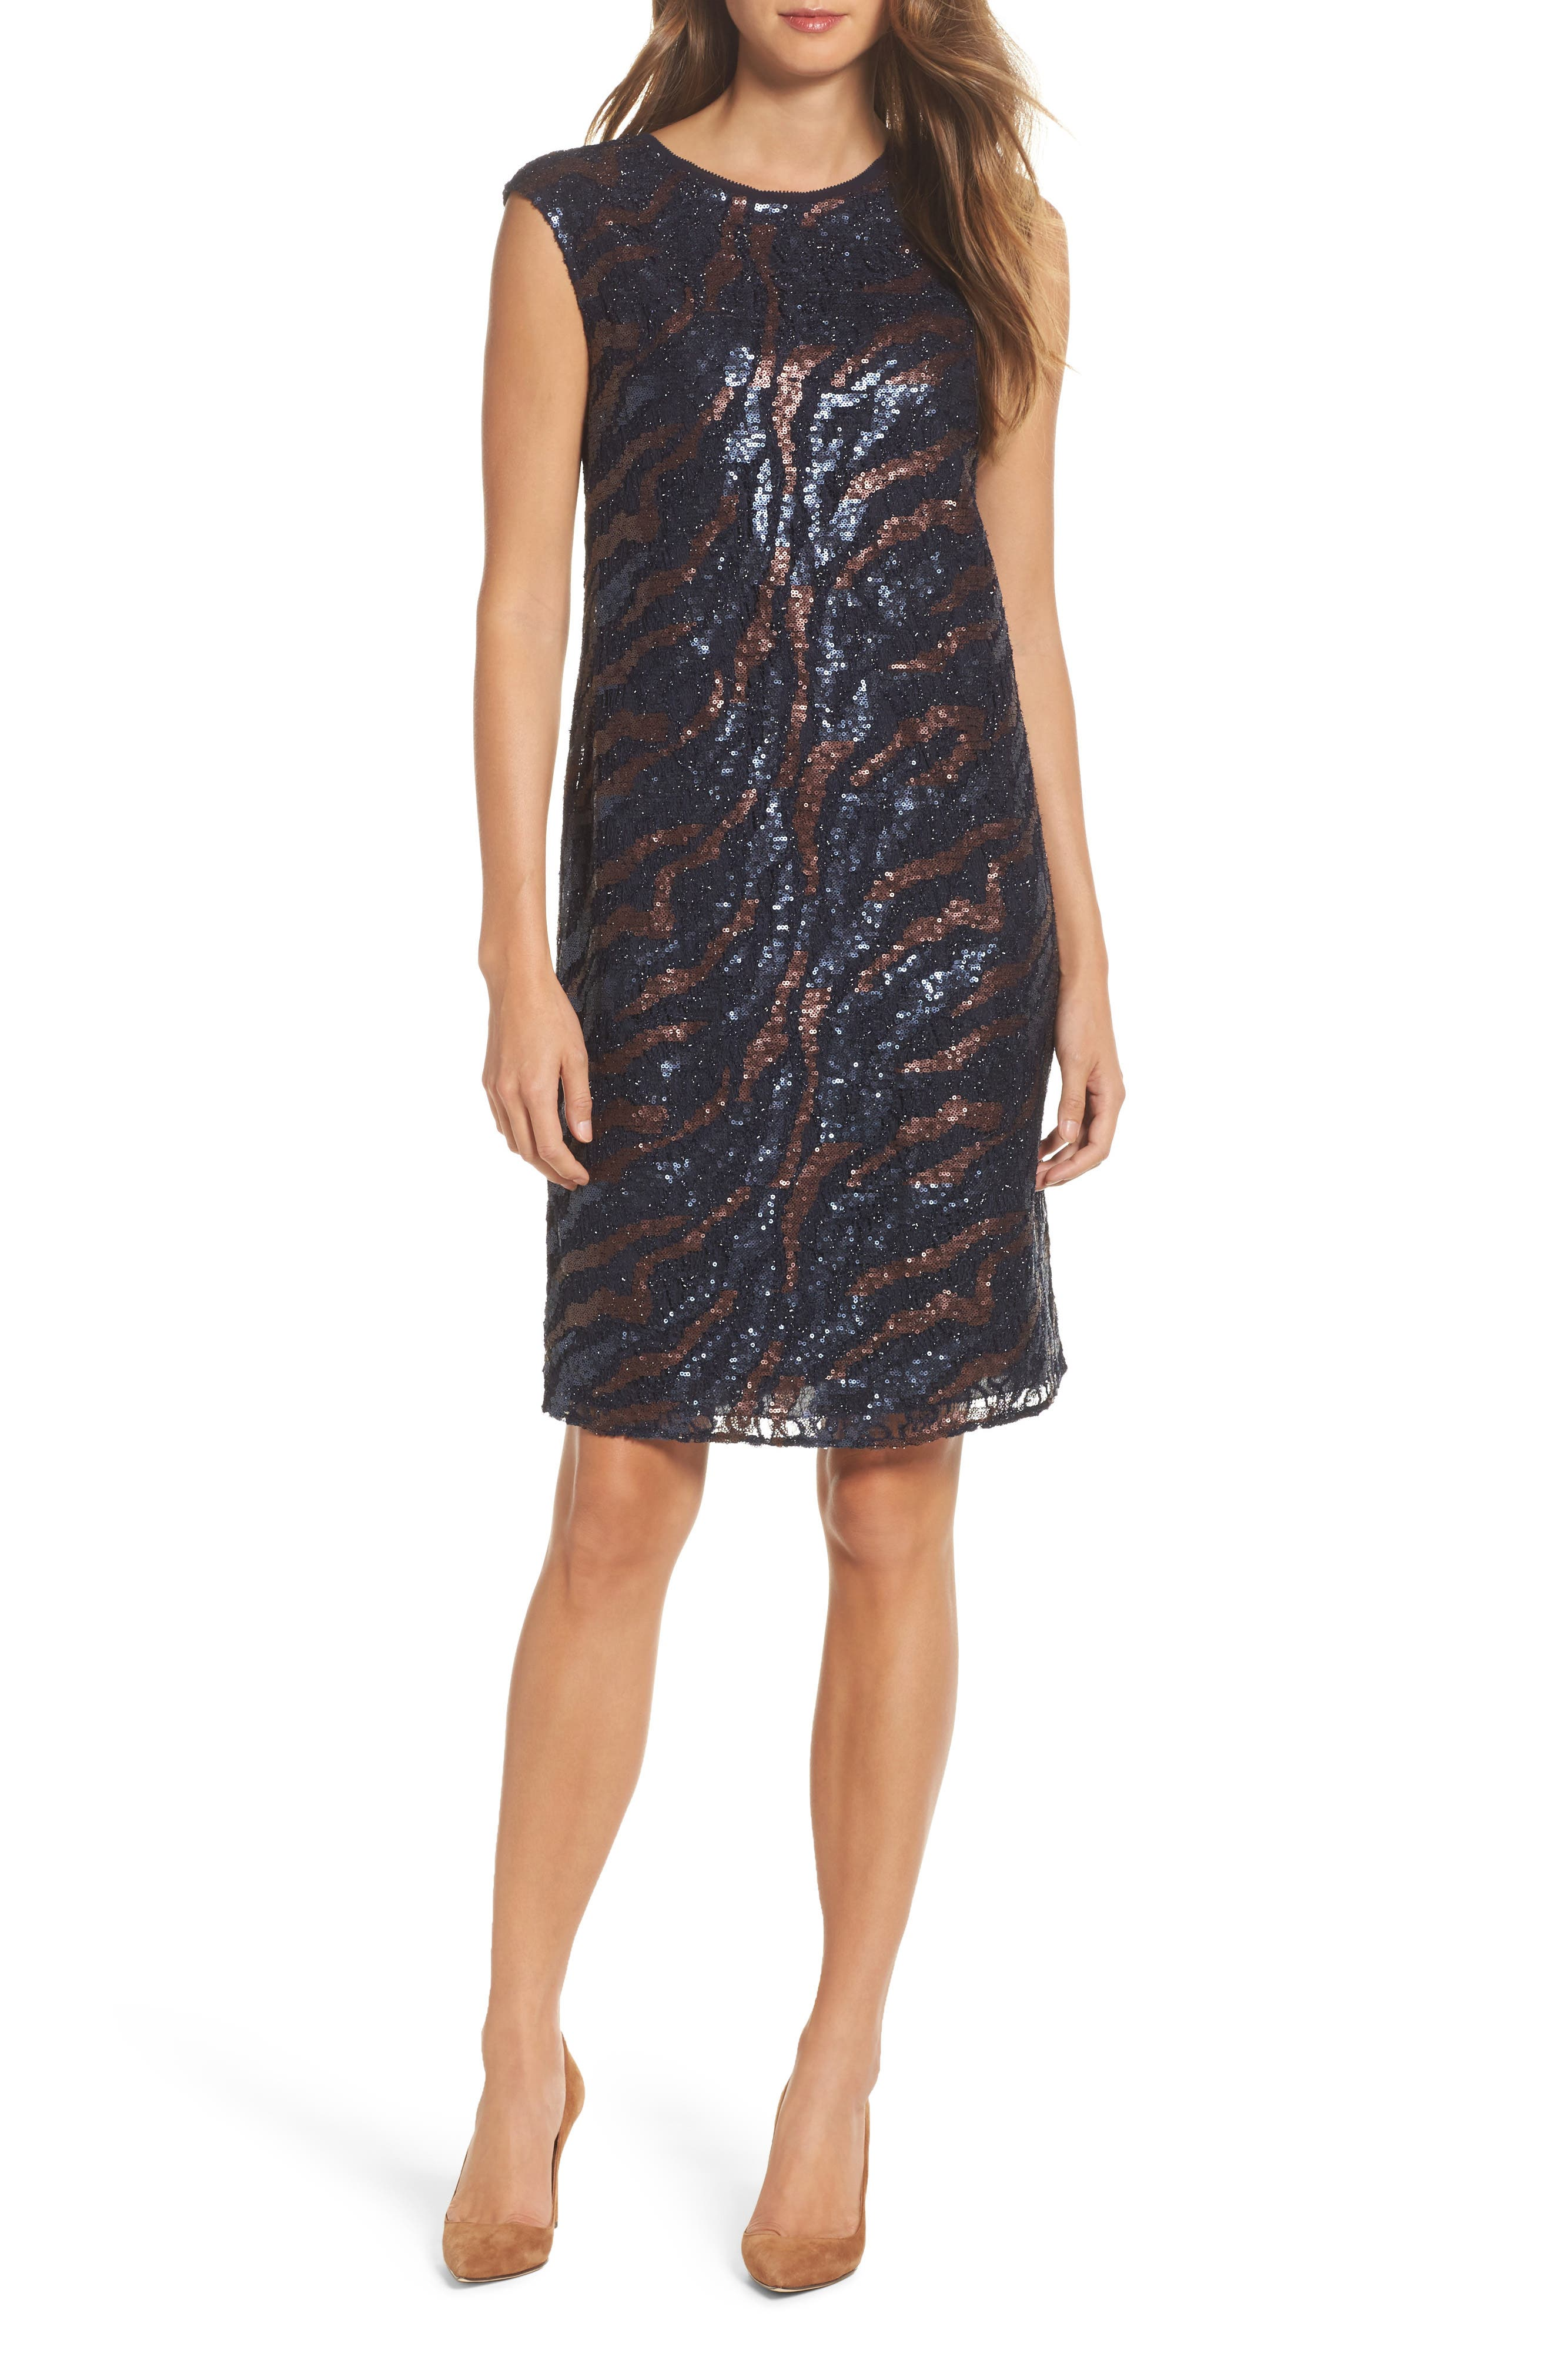 NIC + Zoe Sequin Lace Shift Dress,                         Main,                         color, 229